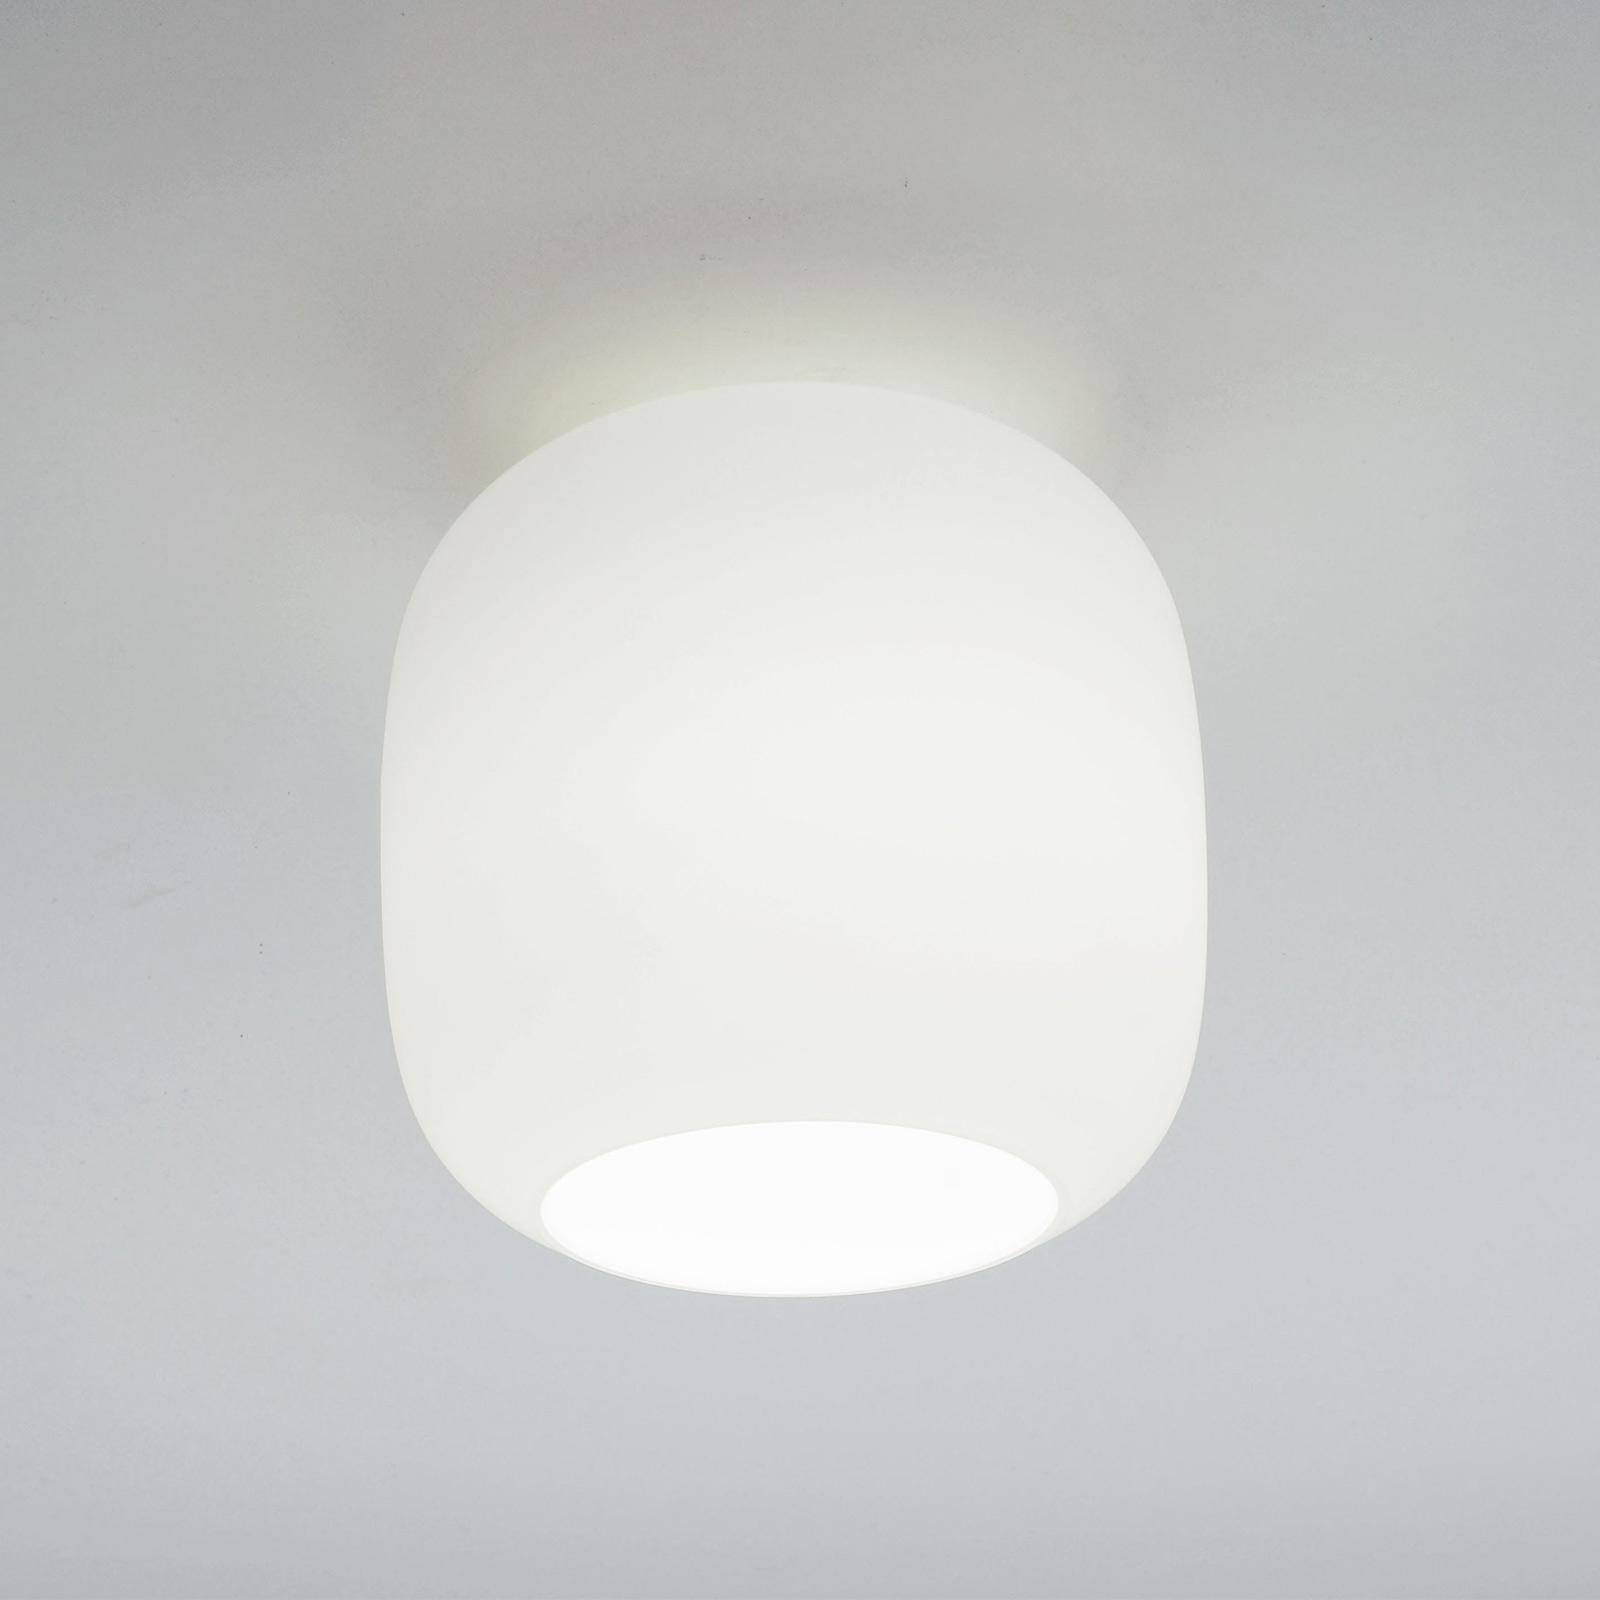 Acquista Casablanca Murea plafoniera, bianco opale, Ø 25 cm